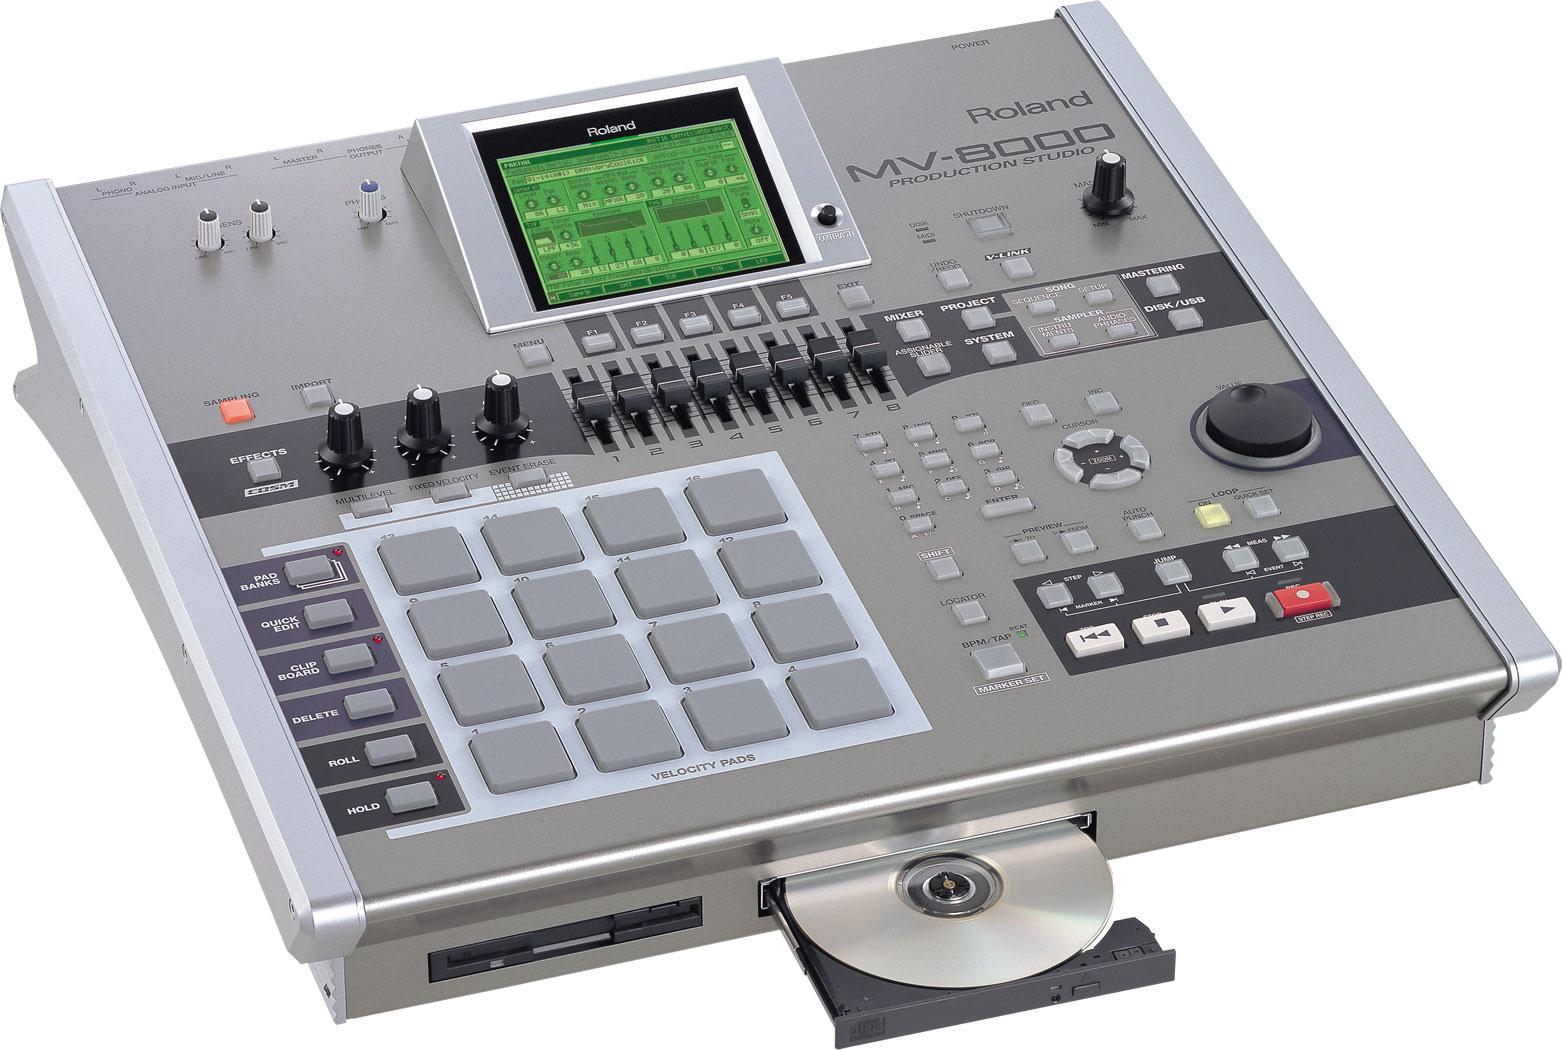 Roland - MV-8000 | Production Studio